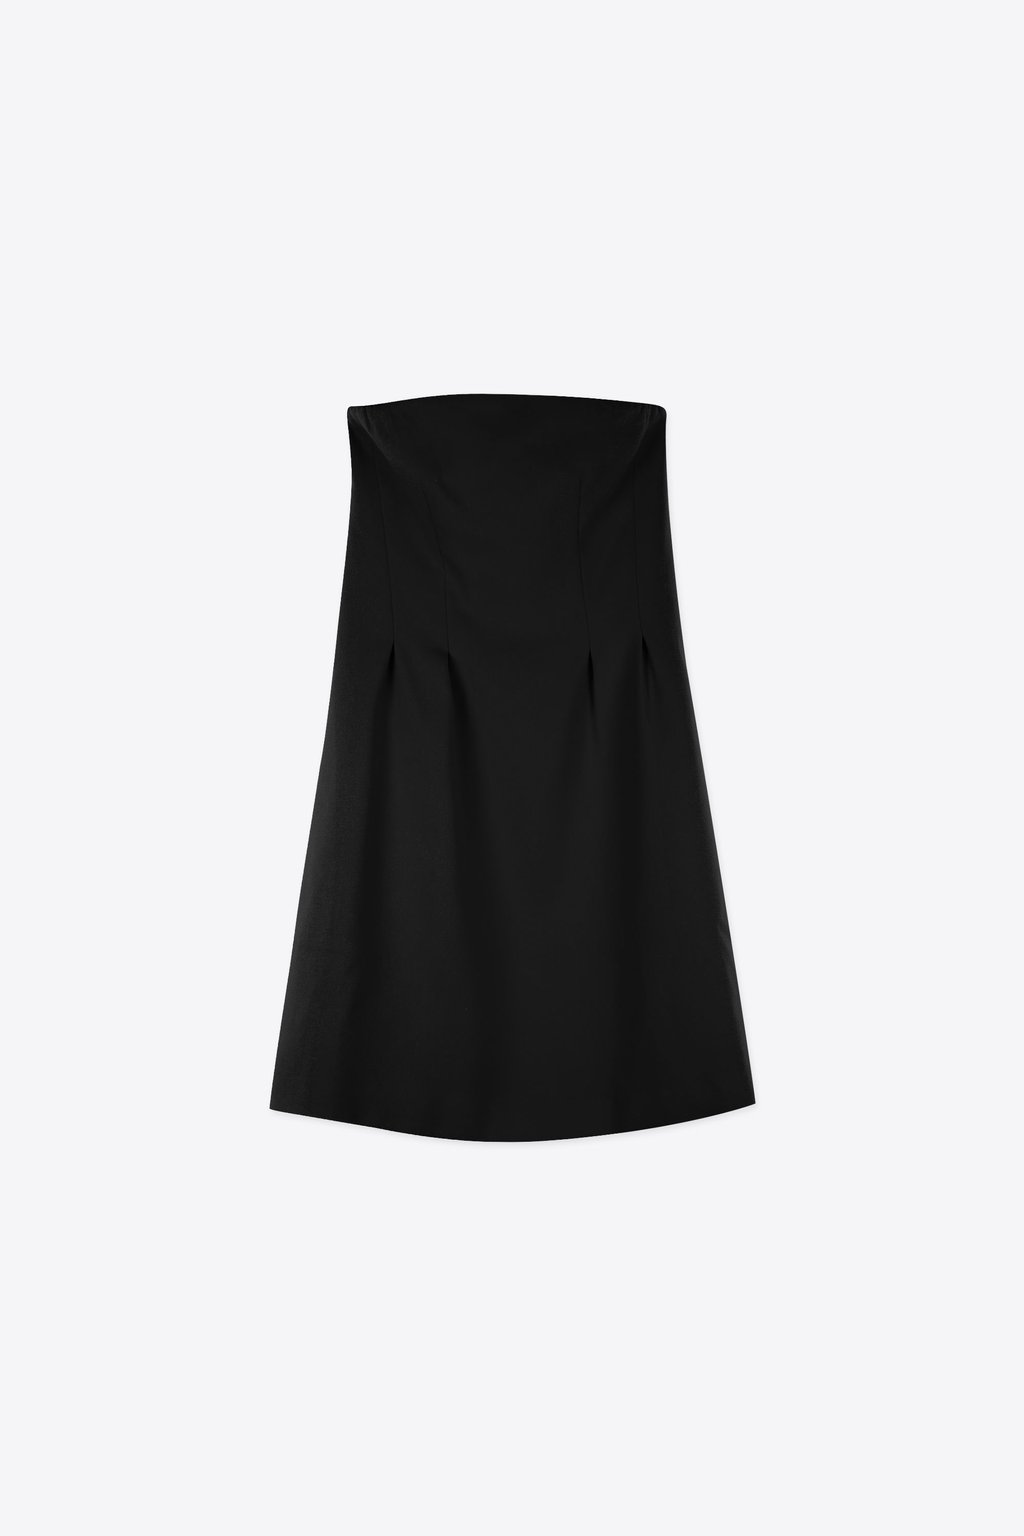 Dress 1167 Black 7